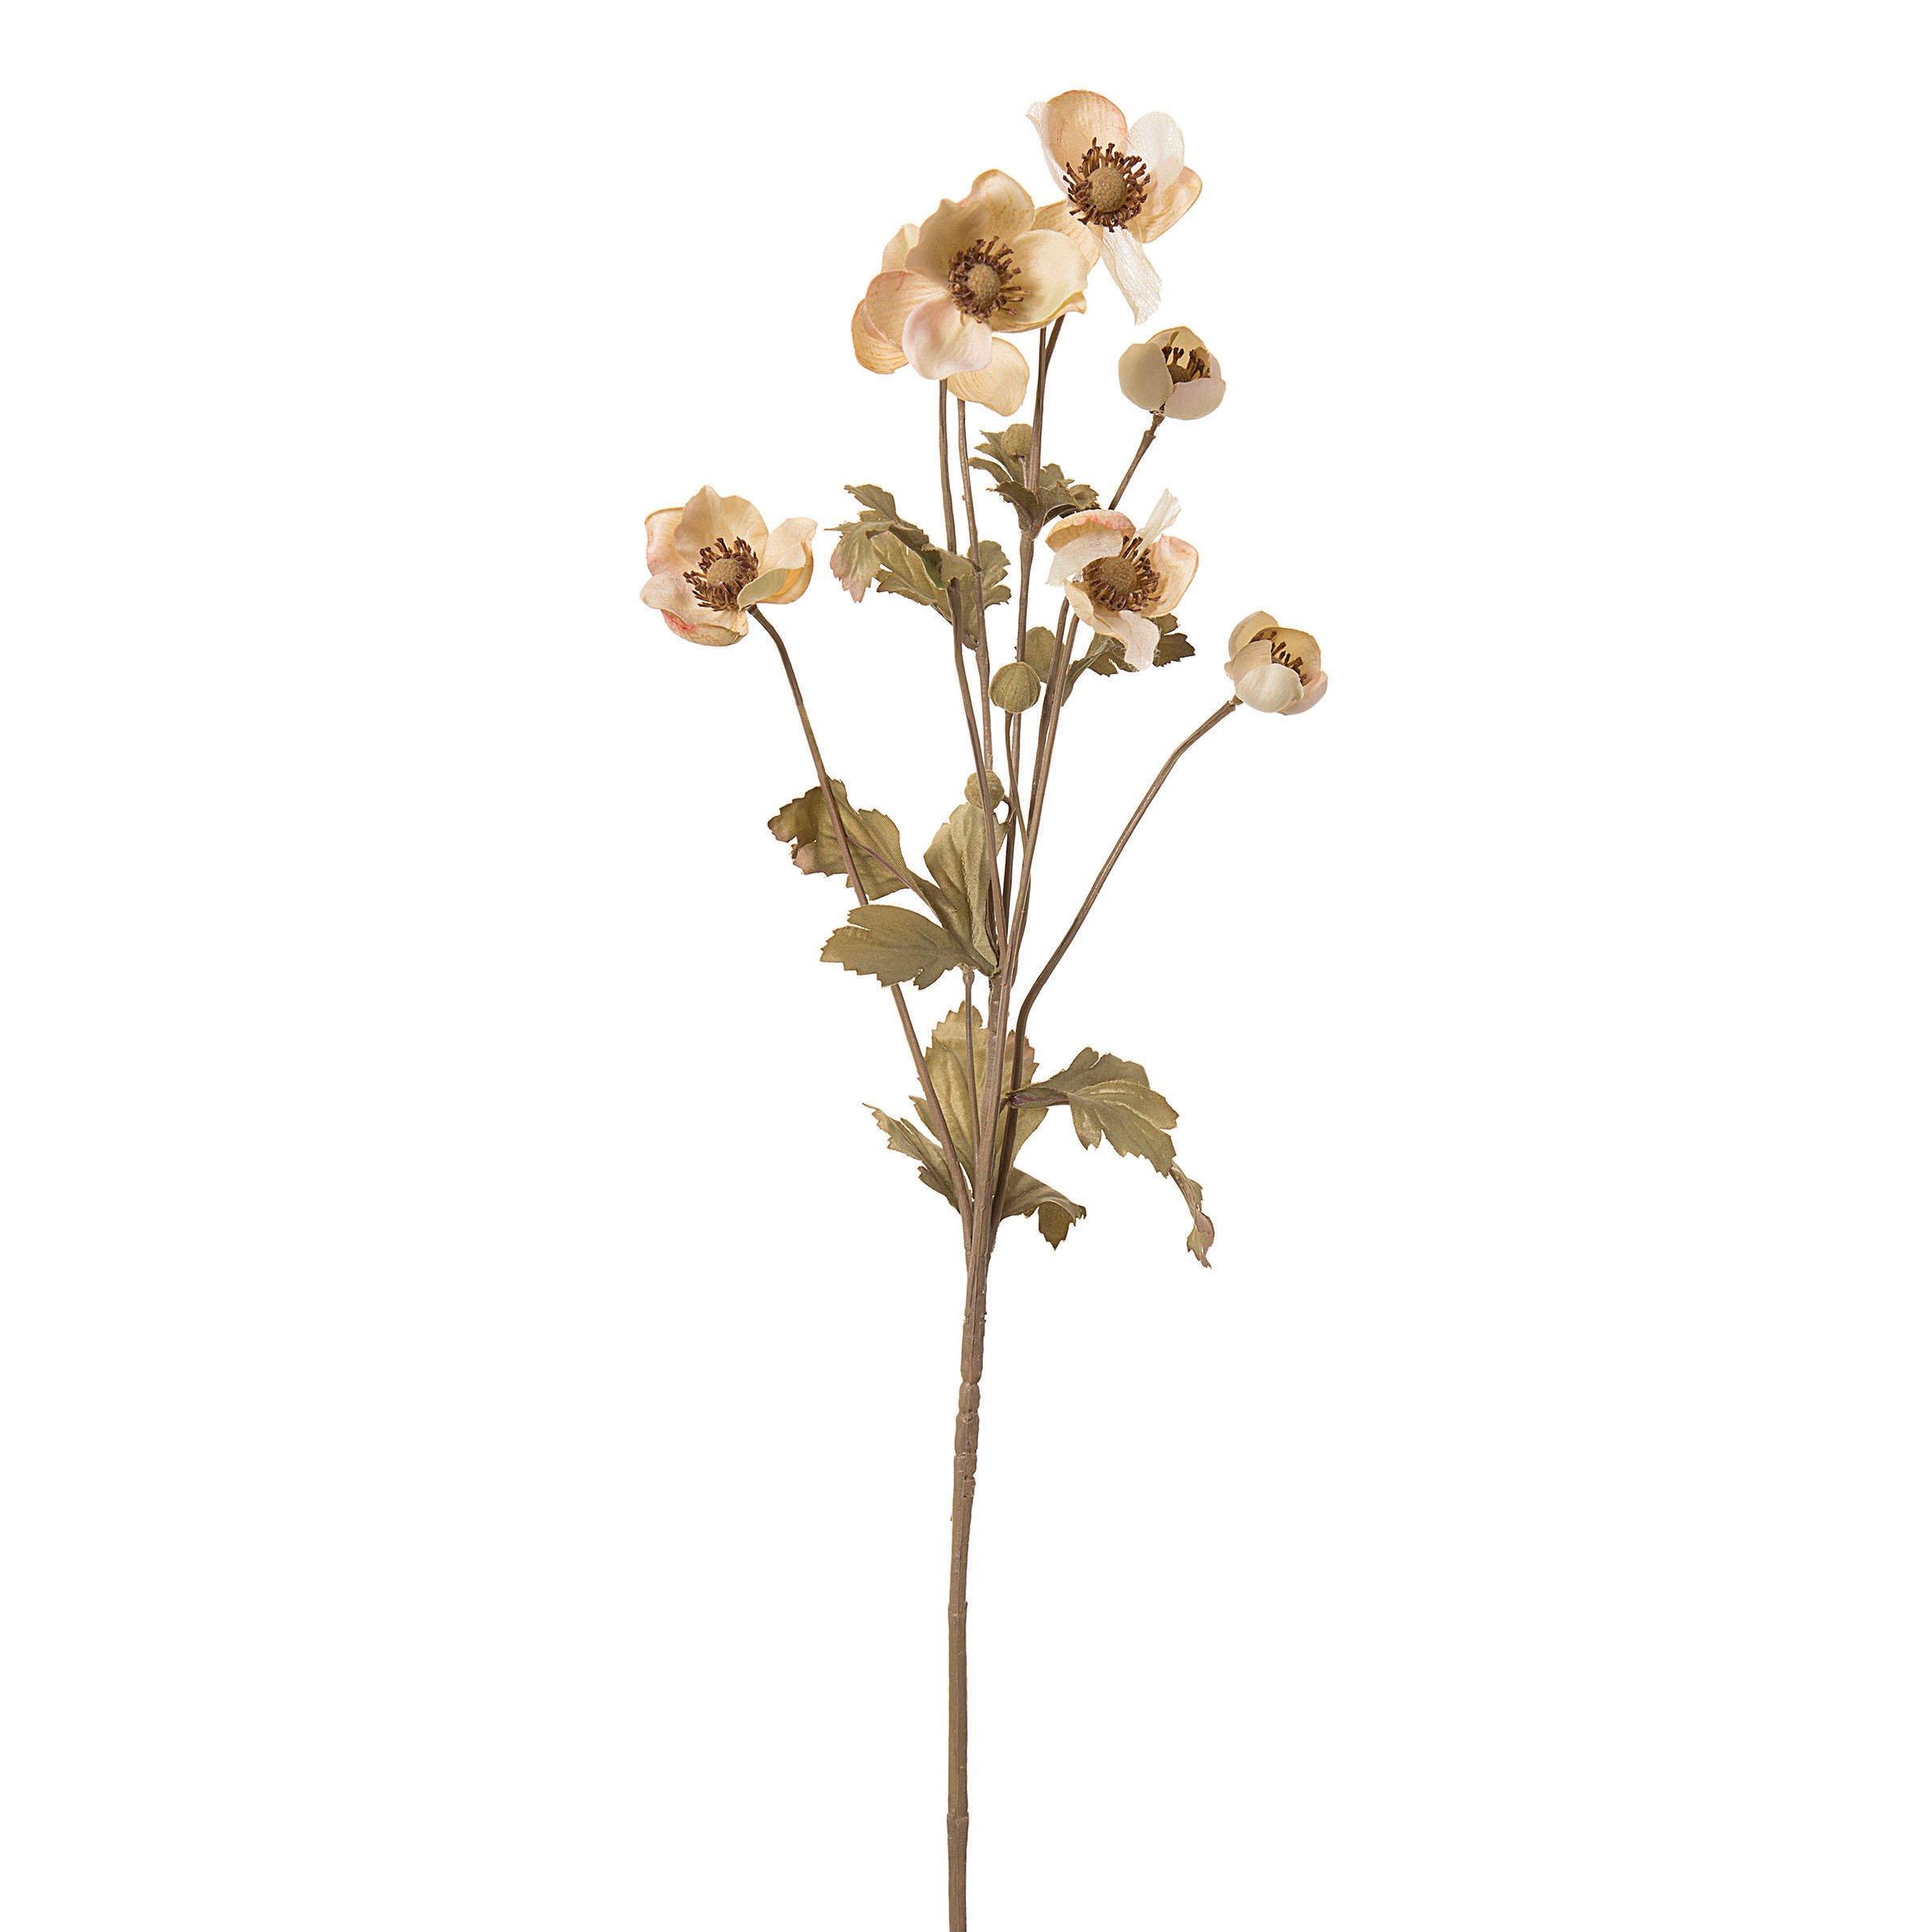 Darice Kbi-11733-1 Everyday Long Stem Dry Anemone, 27'', Cream